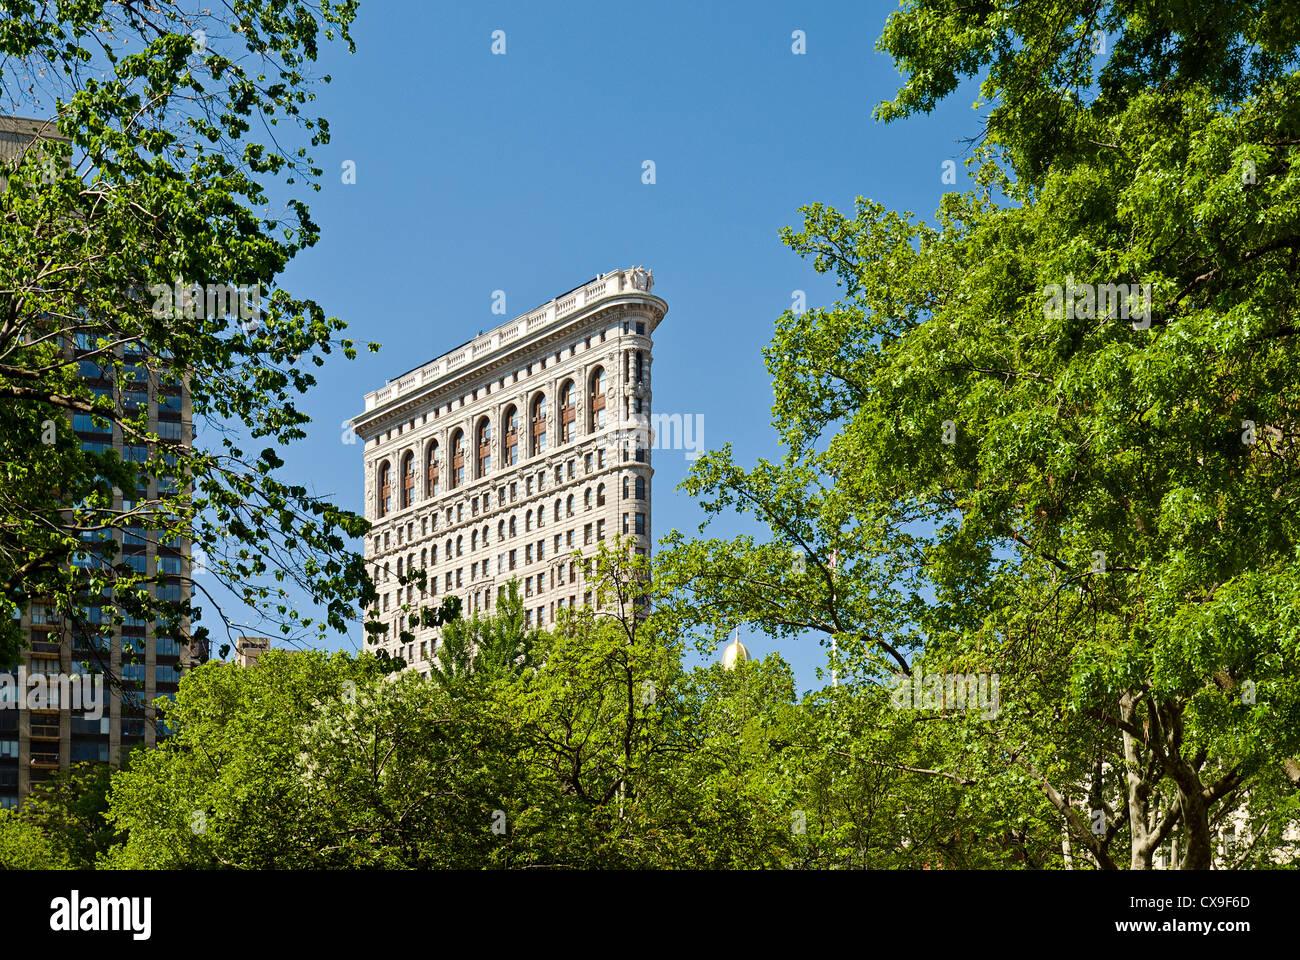 Das Flatiron Building und Madison Square Park, 23rd Street, New York City. Stockbild